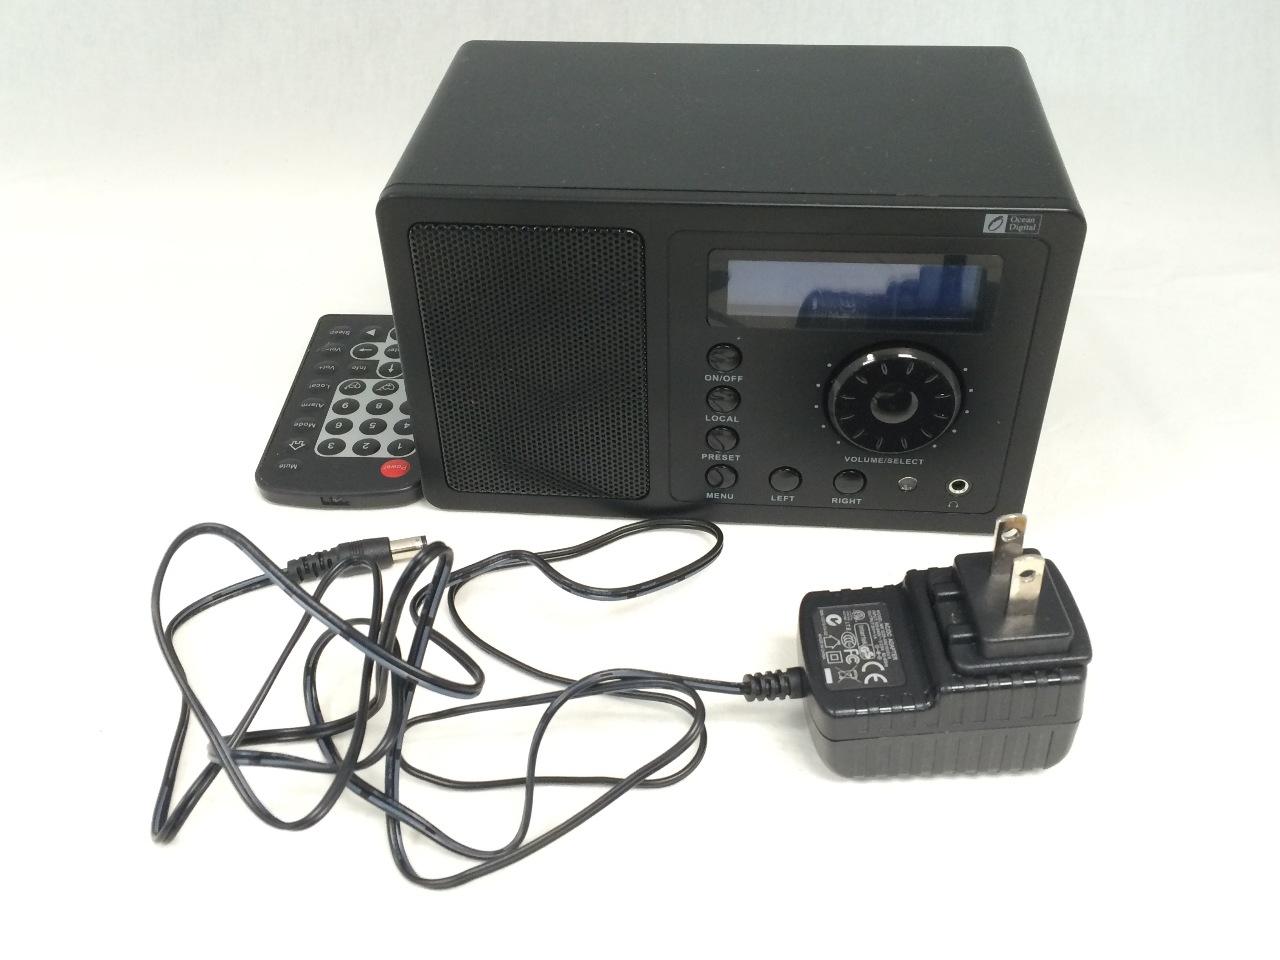 ocean digital internet radio wr220 wifi wlan receiver tuner black buy stuff store. Black Bedroom Furniture Sets. Home Design Ideas